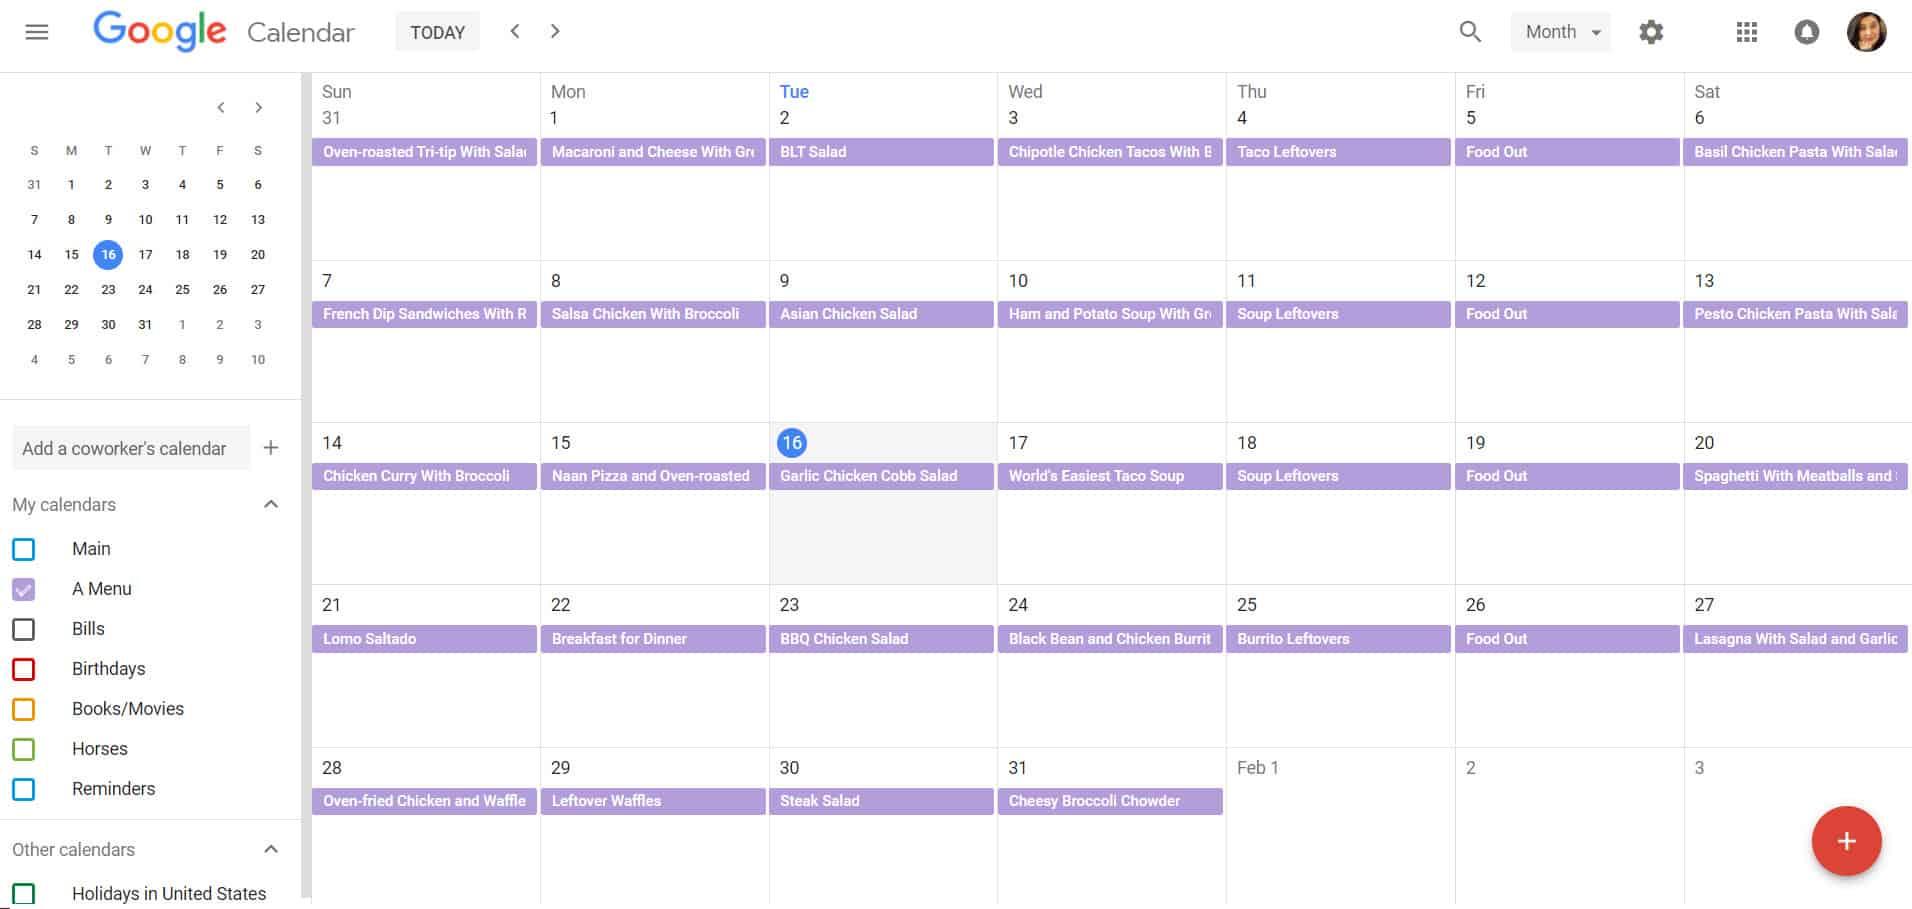 Meal Calendar | Meal Planing 101 How To Meal Plan Using Google Calendar Baking